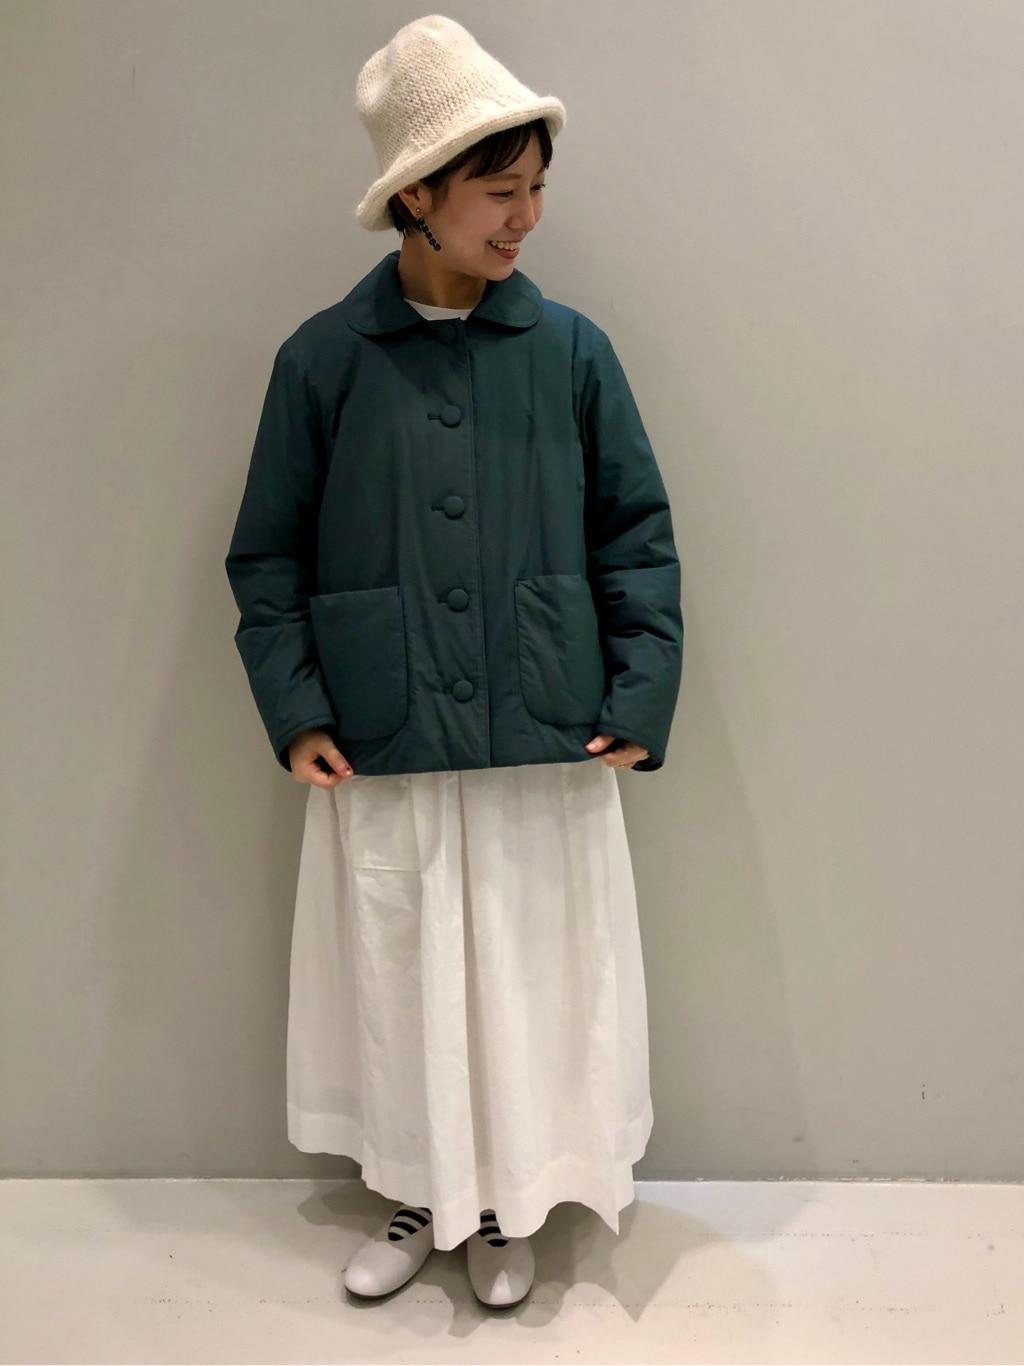 bulle de savon なんばシティ 身長:149cm 2020.11.13